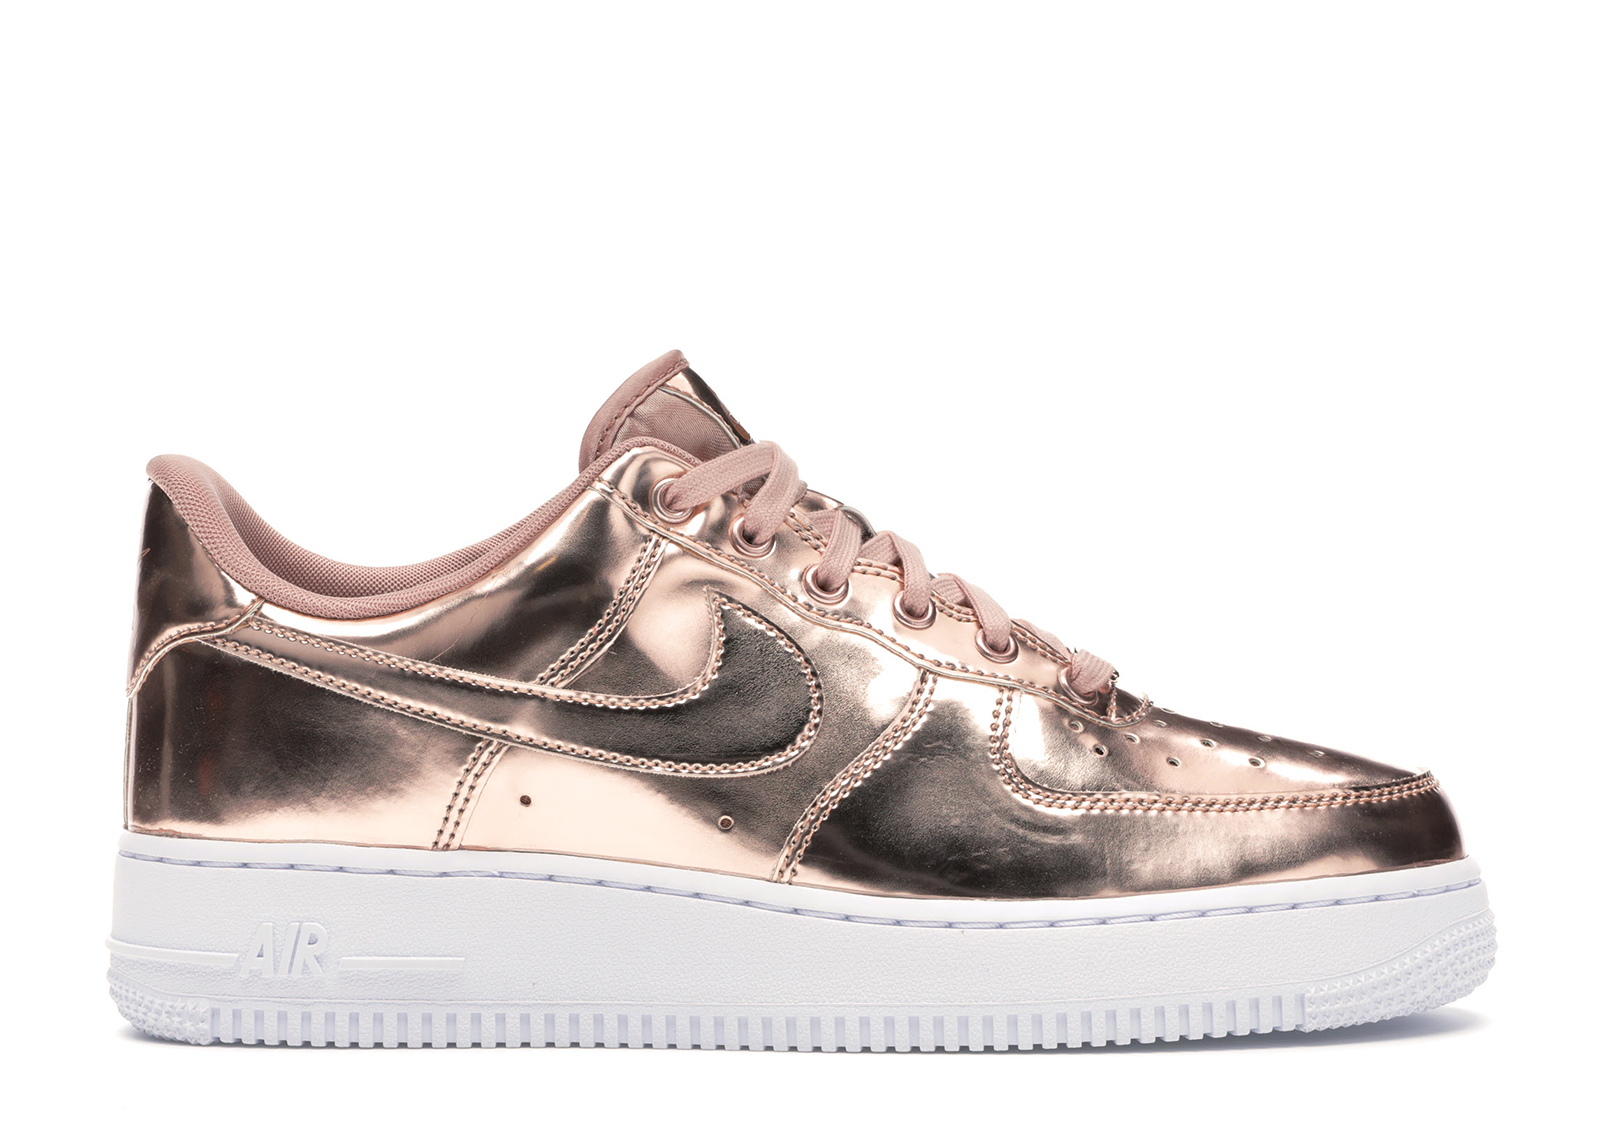 nike air force 1 bronze